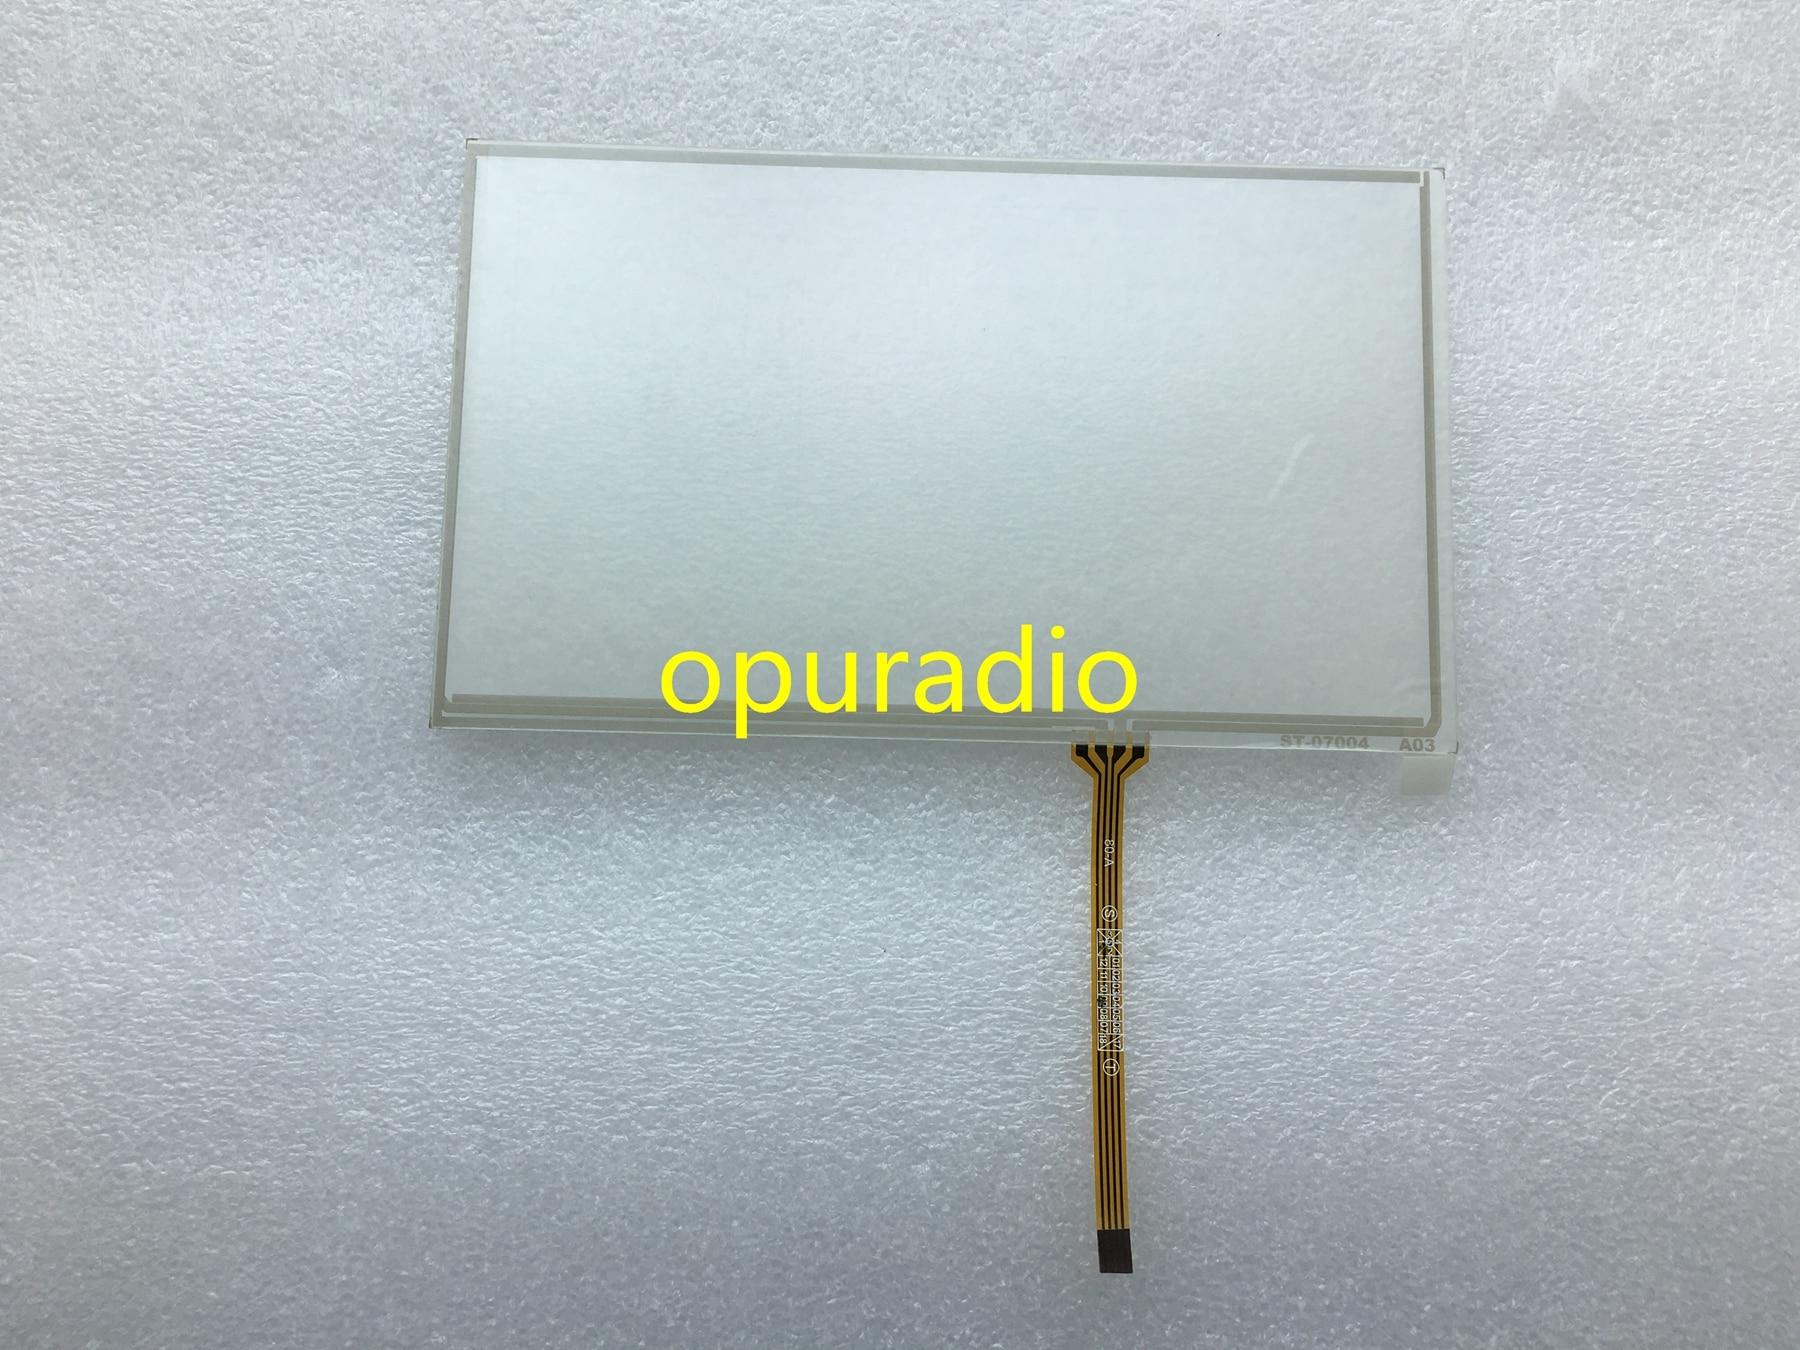 Marke neue 7,1 inch touch screen für AT070TN83 V.1 AT070TN82 AT070TN84 touch digitizer panel Glas 164*103 165*104